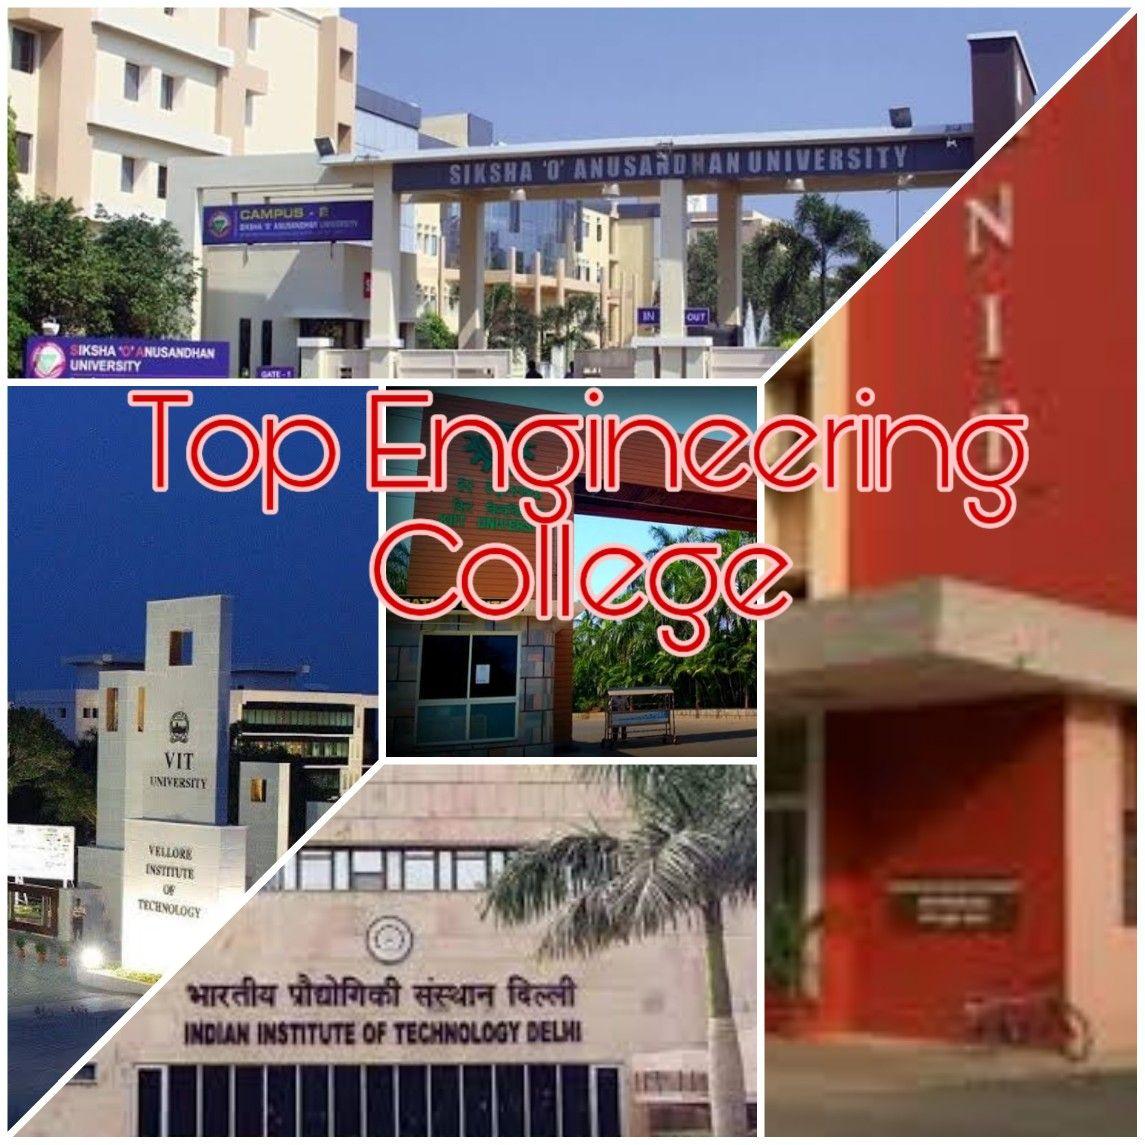 Top Engineering Colleges In 2020 Top Engineering Colleges Engineering Colleges Engineering